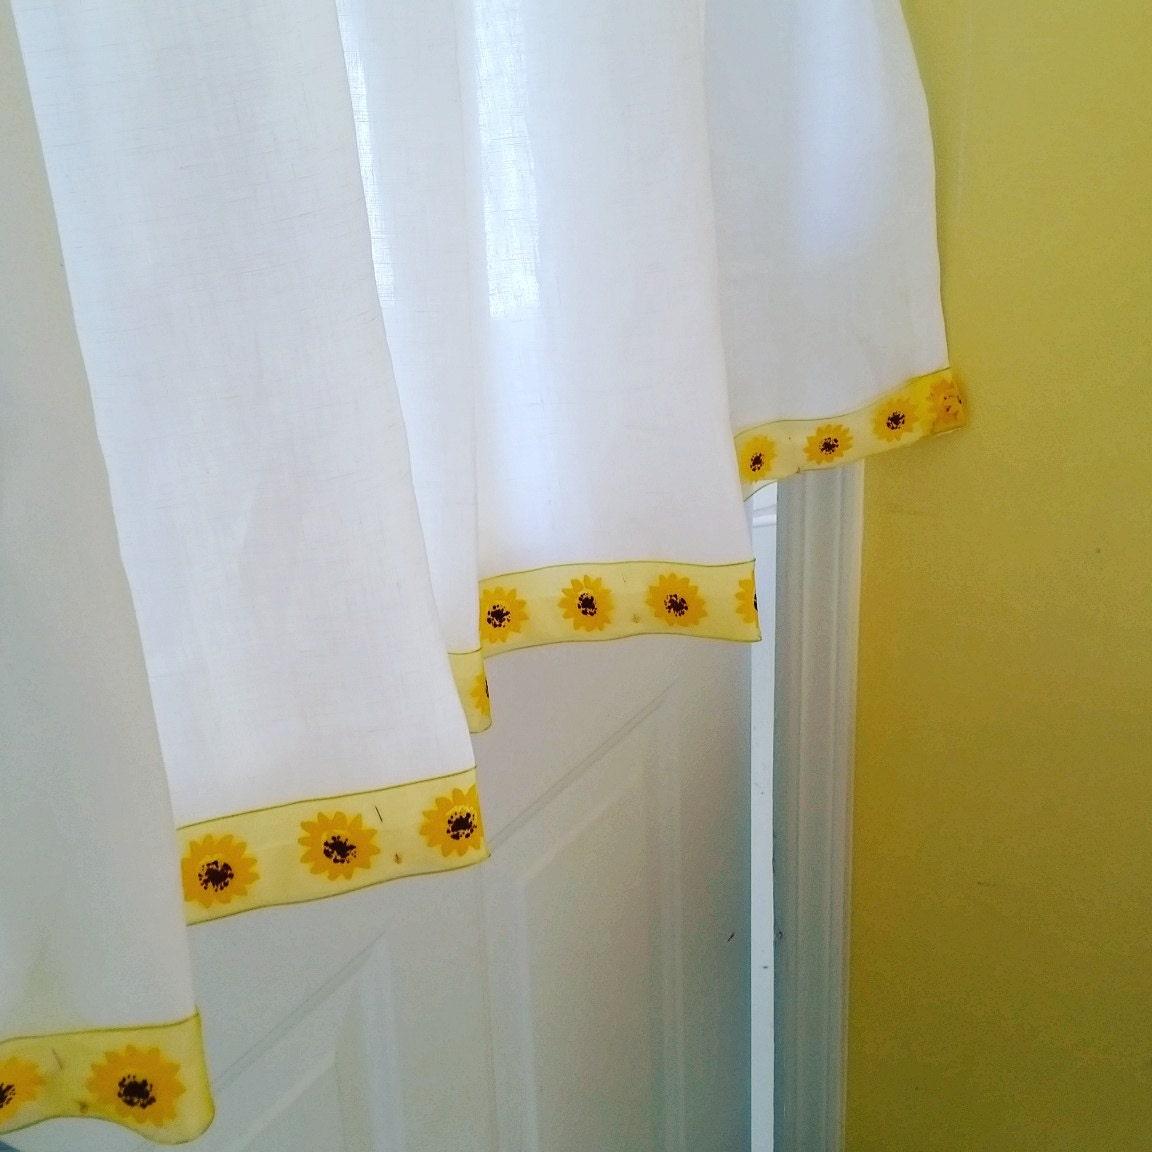 Yellow curtains for kitchen - Kitchen Curtains White Linen Cafe Curtain Irish Handkerchief Linen Kitchen Cafe Curtains